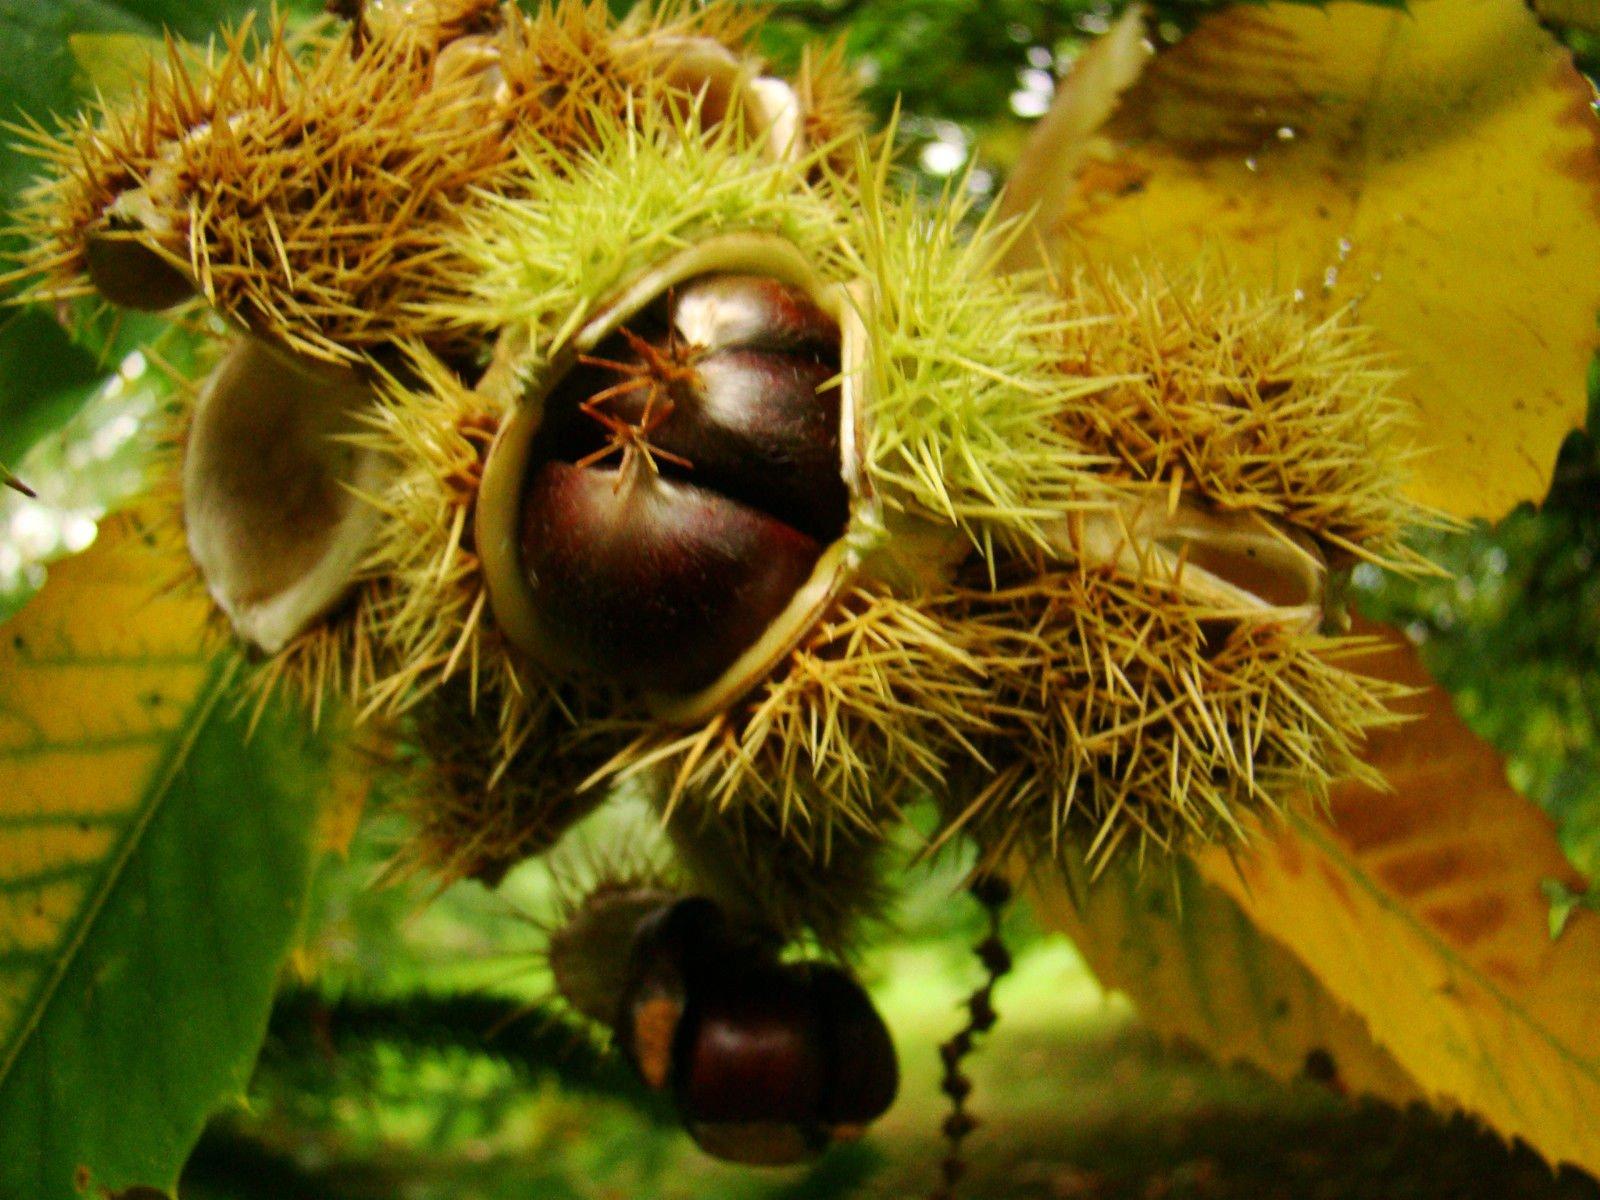 Sweet Chestnut Castanea Sativa Fruit Tree - Autumn Colours Edible Nuts, 15-20cm Tall Starter Plant in an 8cm Pot